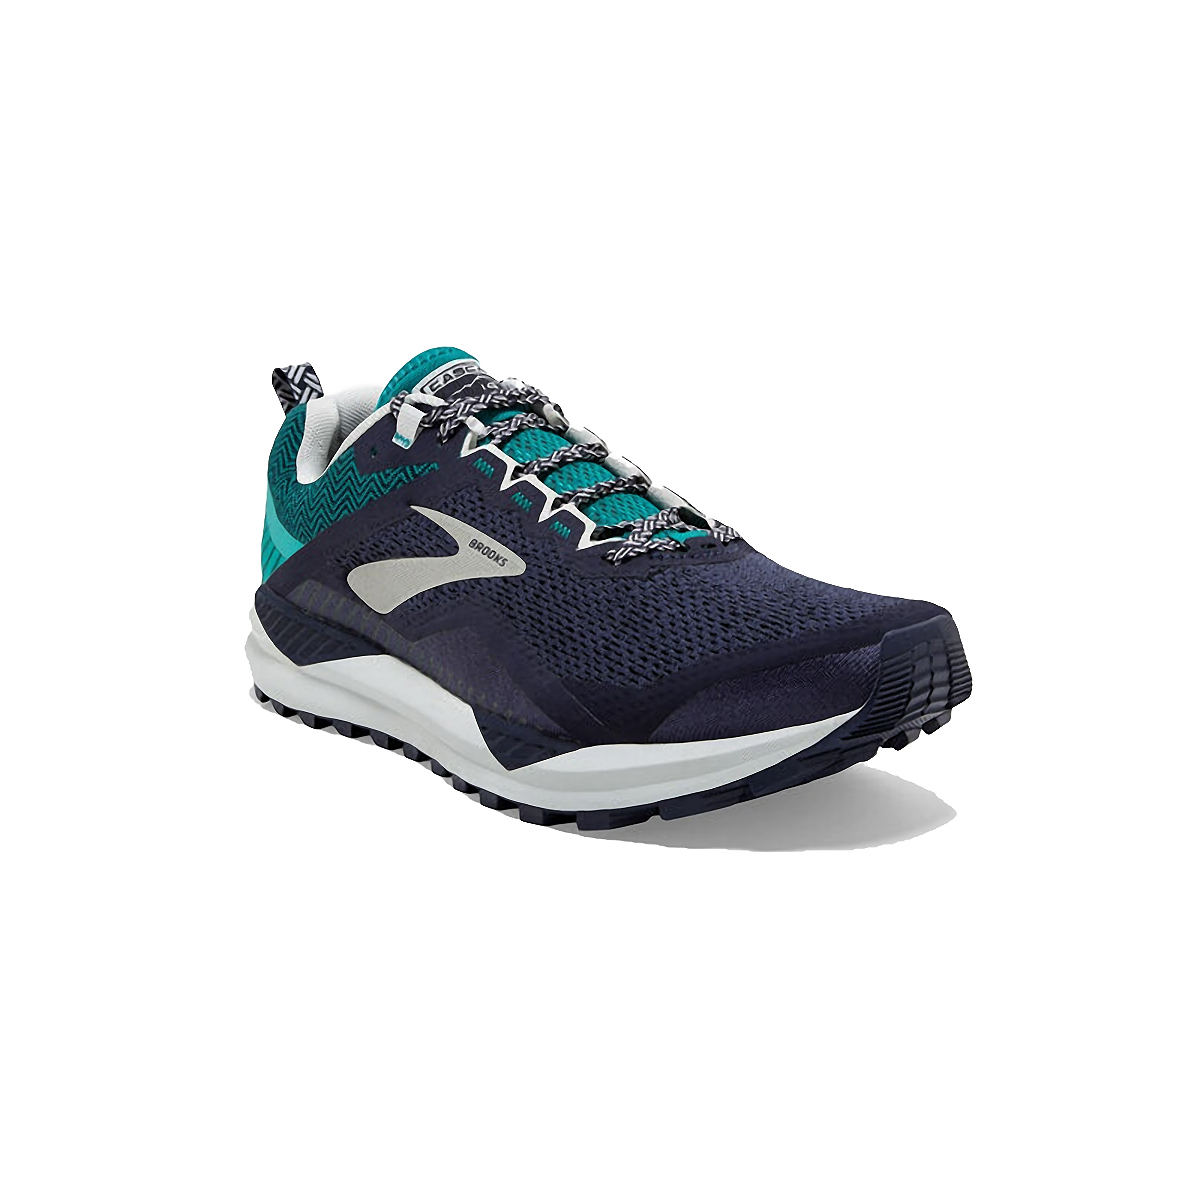 Men's Brooks Cascadia 14 Trail Running Shoe - Color: Navy/Blue Grass - Size: 7 - Width: Regular, Navy/Blue Grass, large, image 4